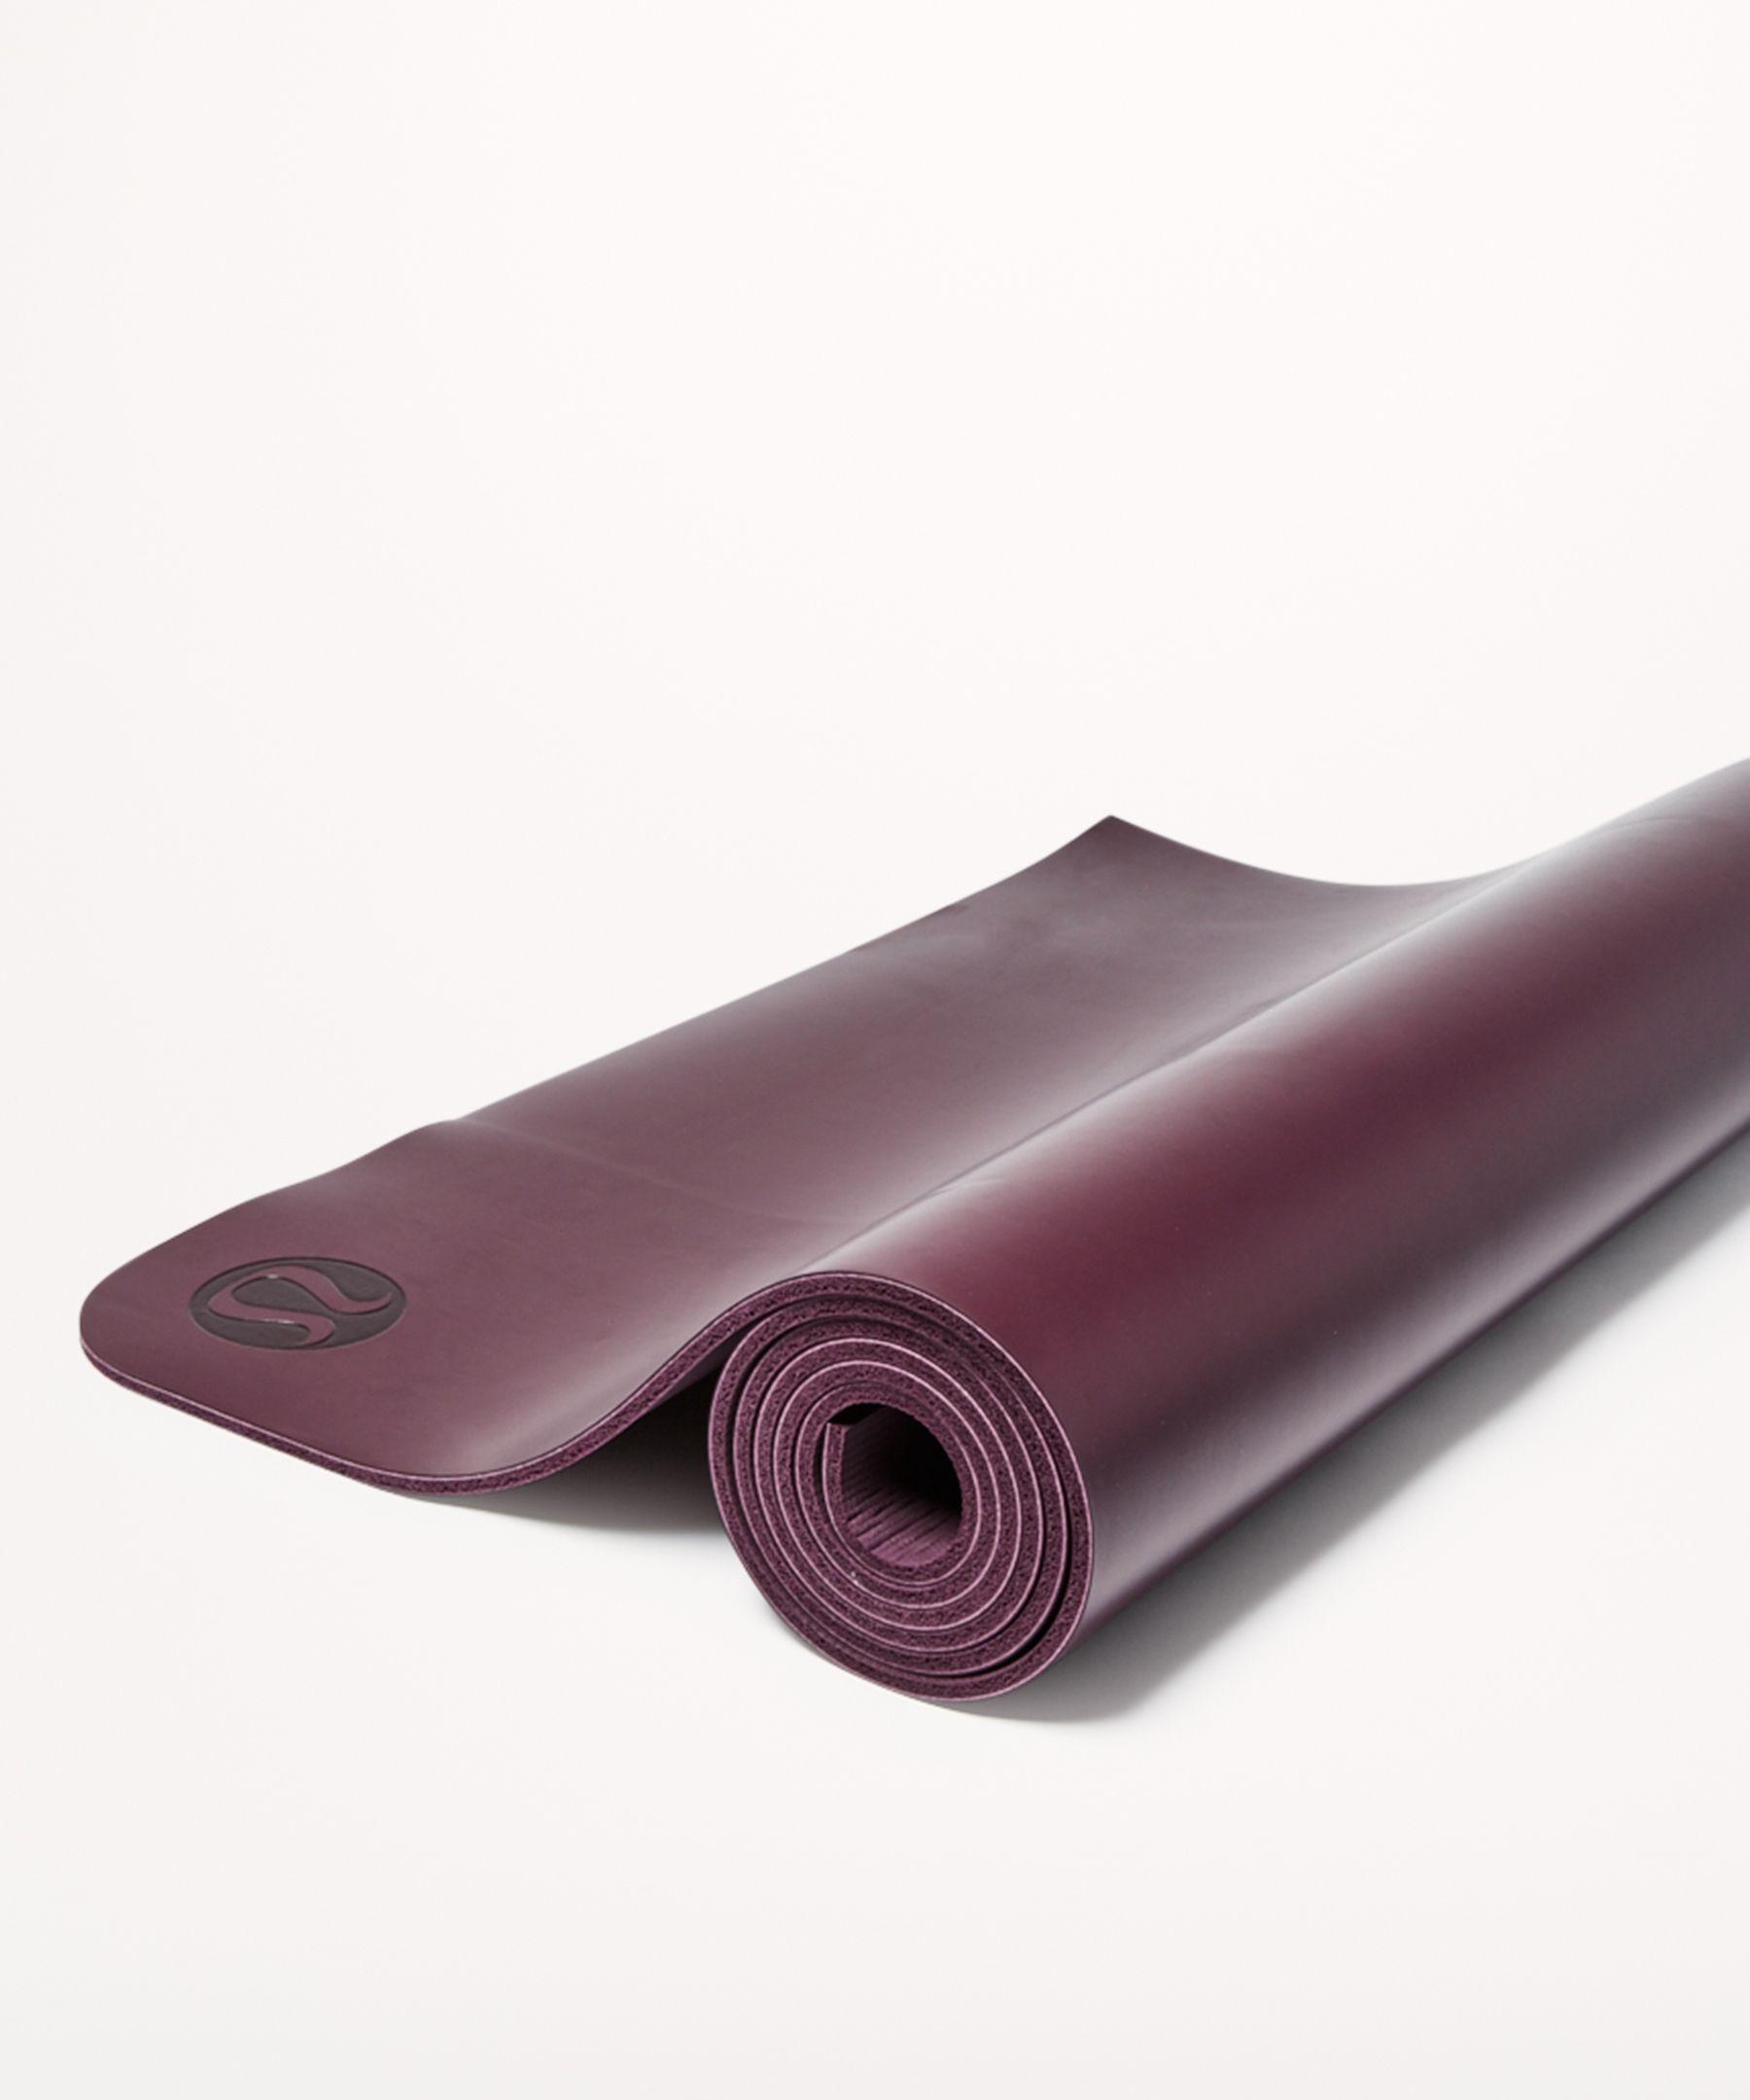 Lululemon Yoga Mat Care Instructions 57 Off Tajpalace Net